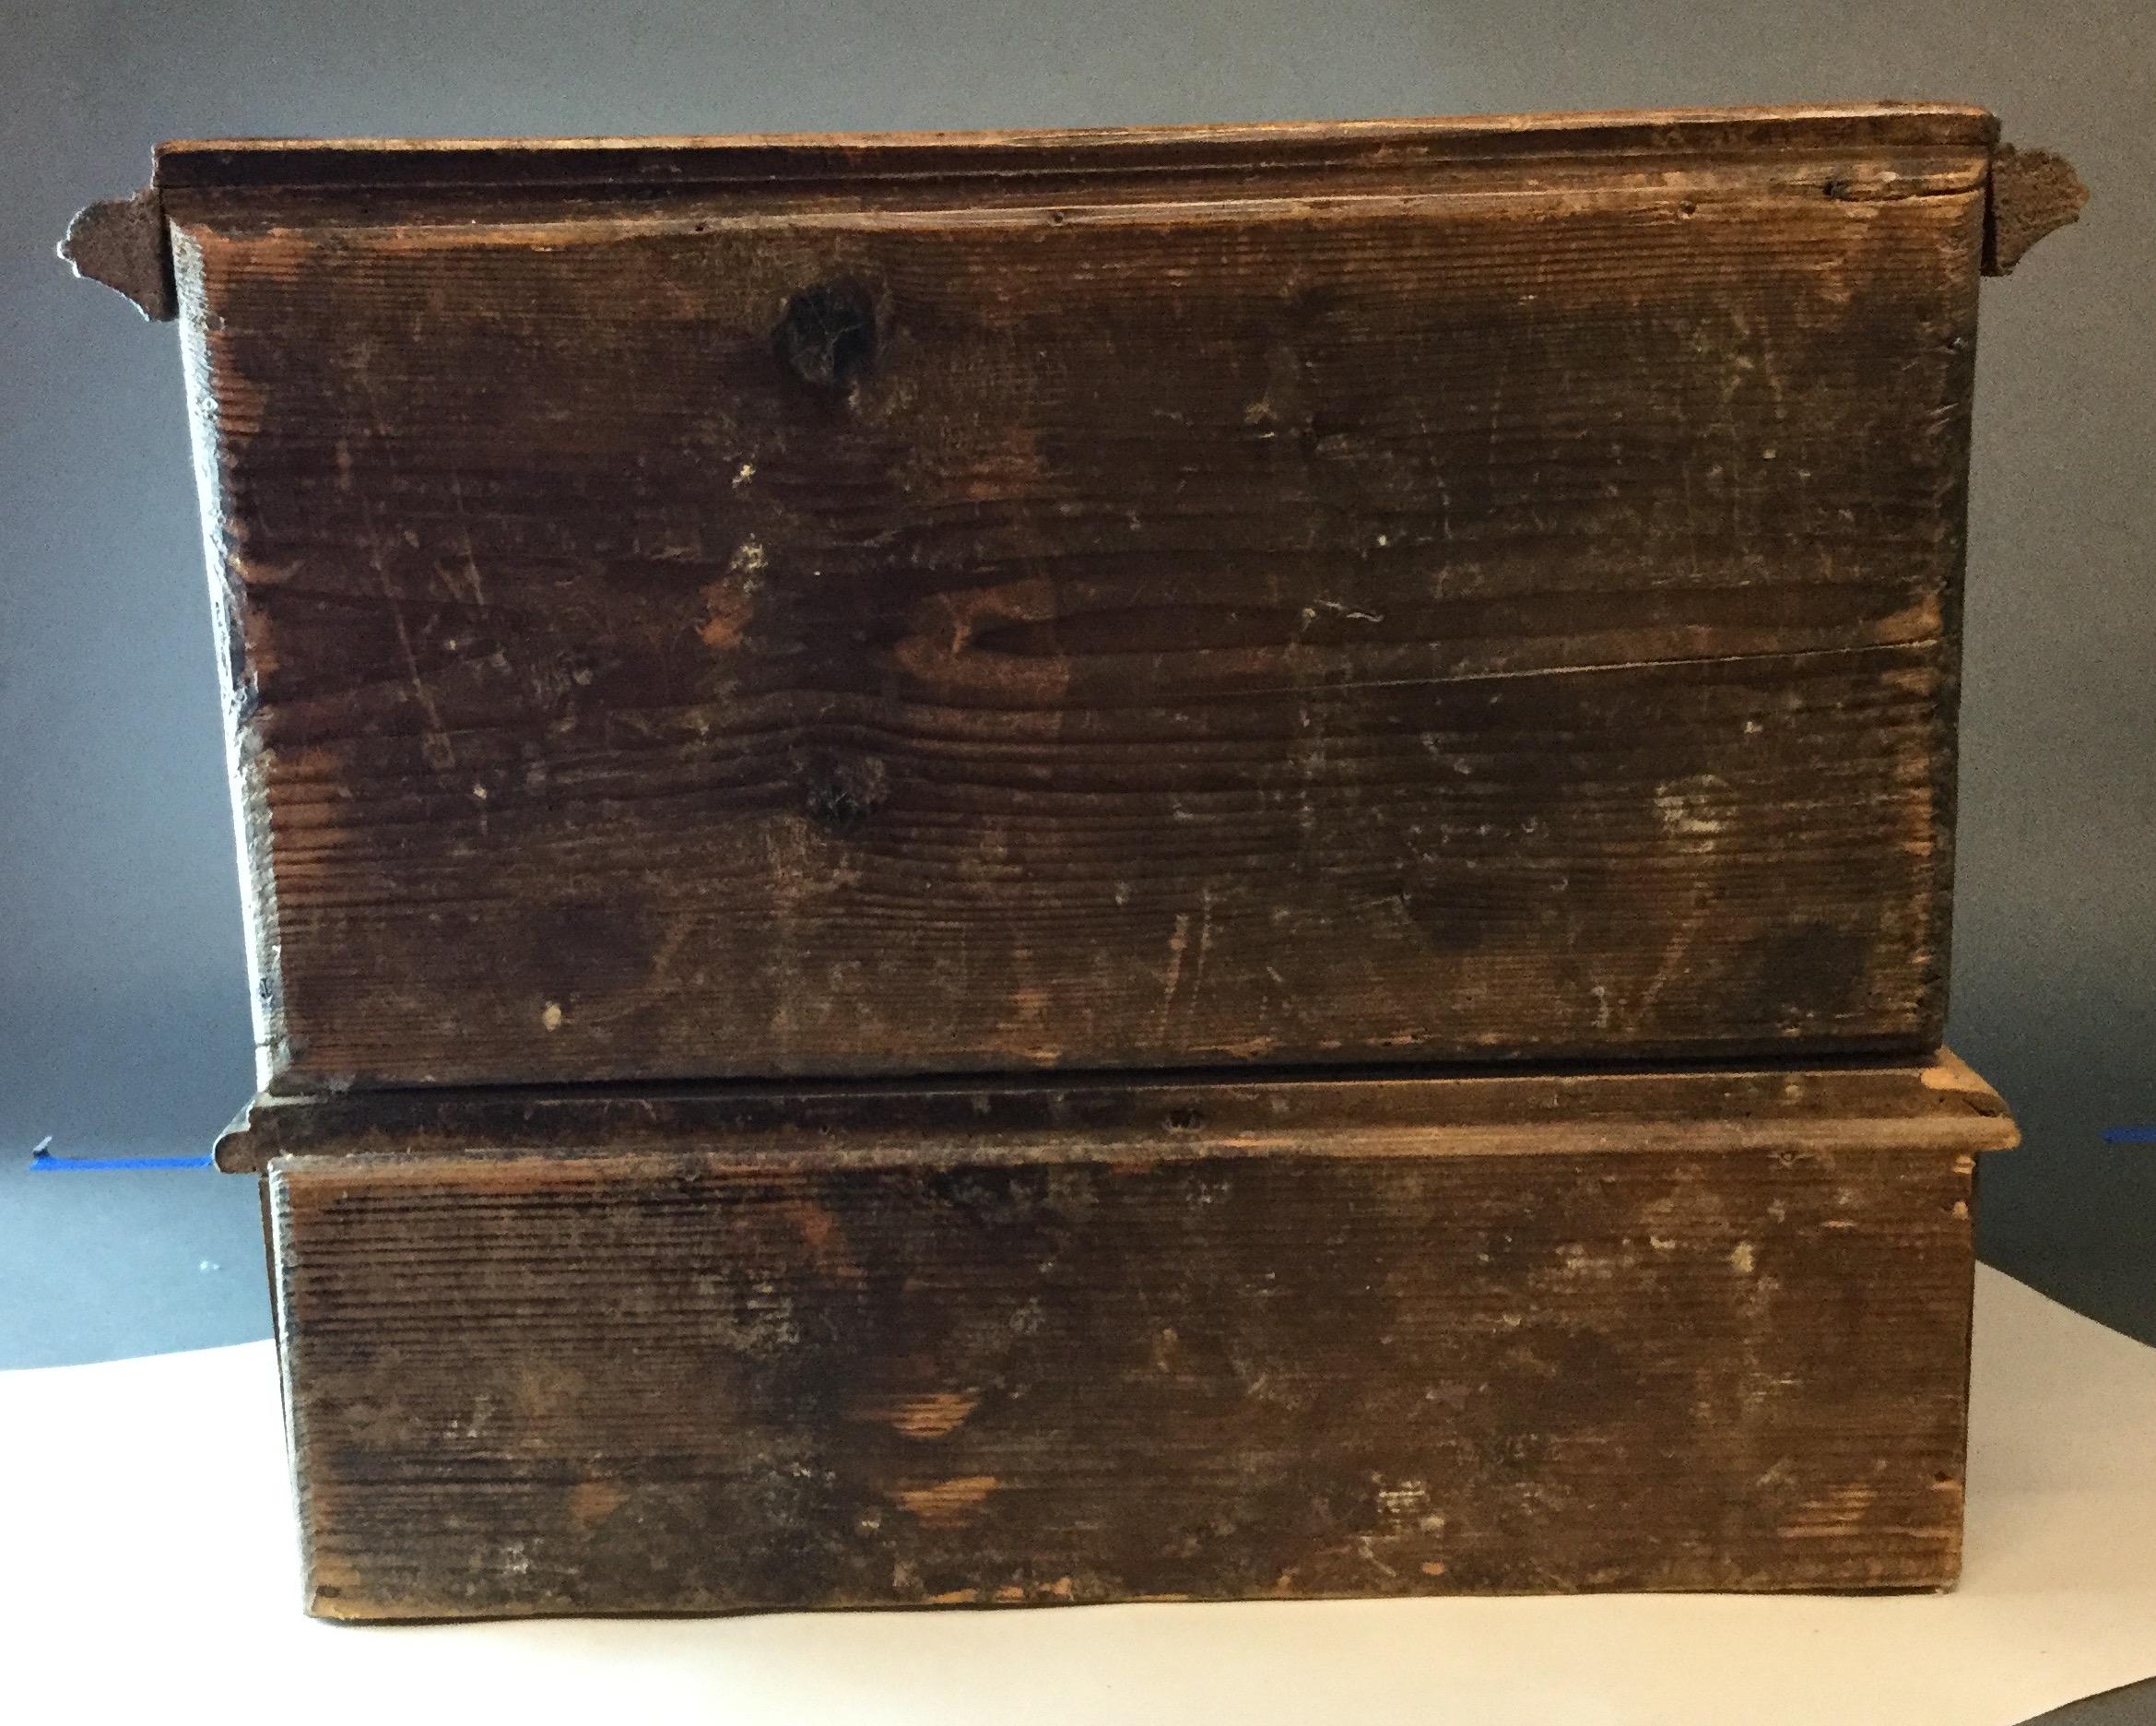 Small-Handmade-Wood-Chest_60273M.jpg